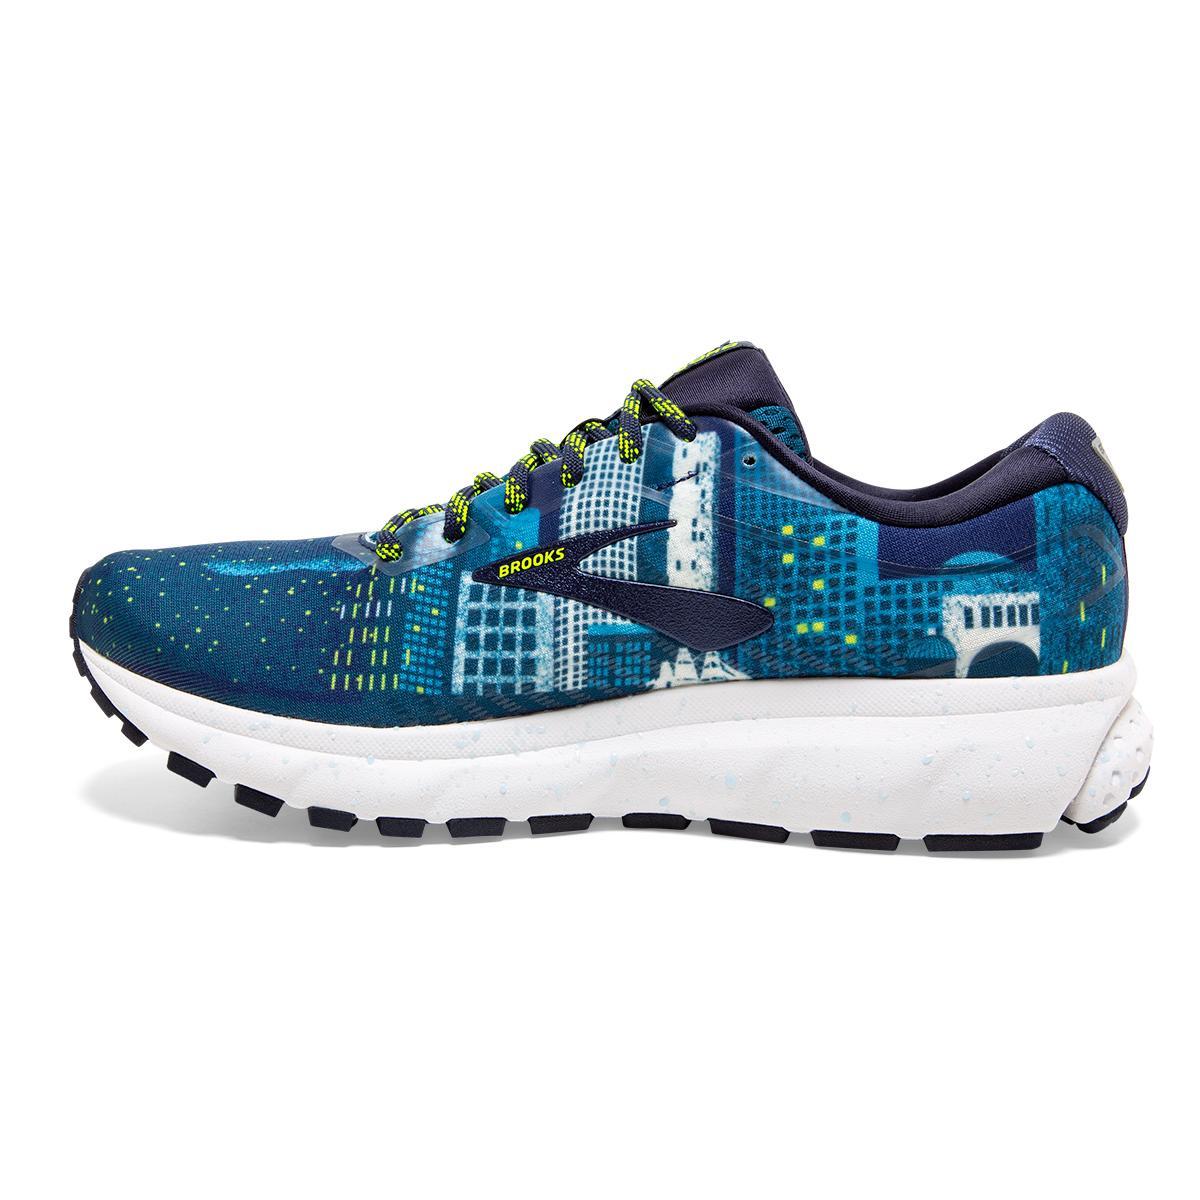 """Brooks Ghost 12 Run Boston Edition"" รองเท้าที่ทำรวมกับงานวิ่งมาราธอนที่เก่าแก่ที่สุดในโลก 02"